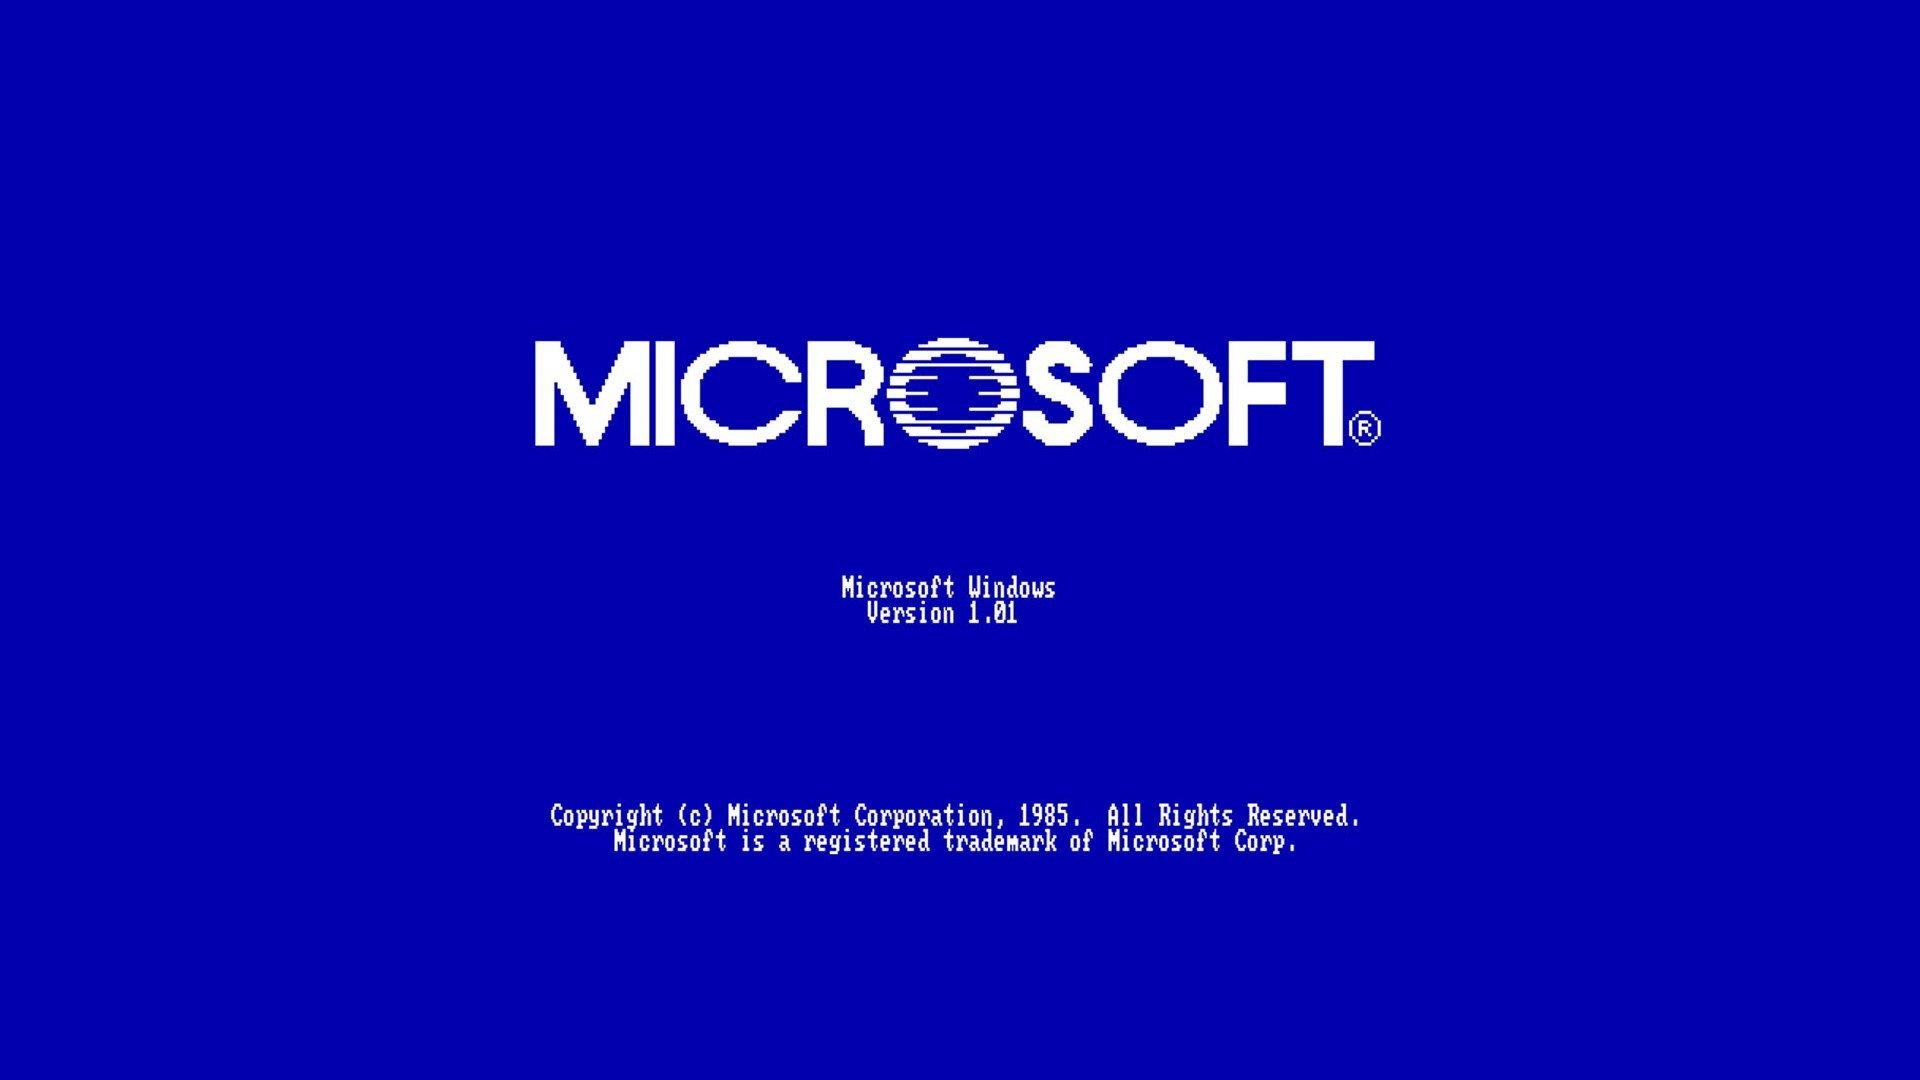 Microsoft, Microsoft Windows, Operating systems Wallpaper